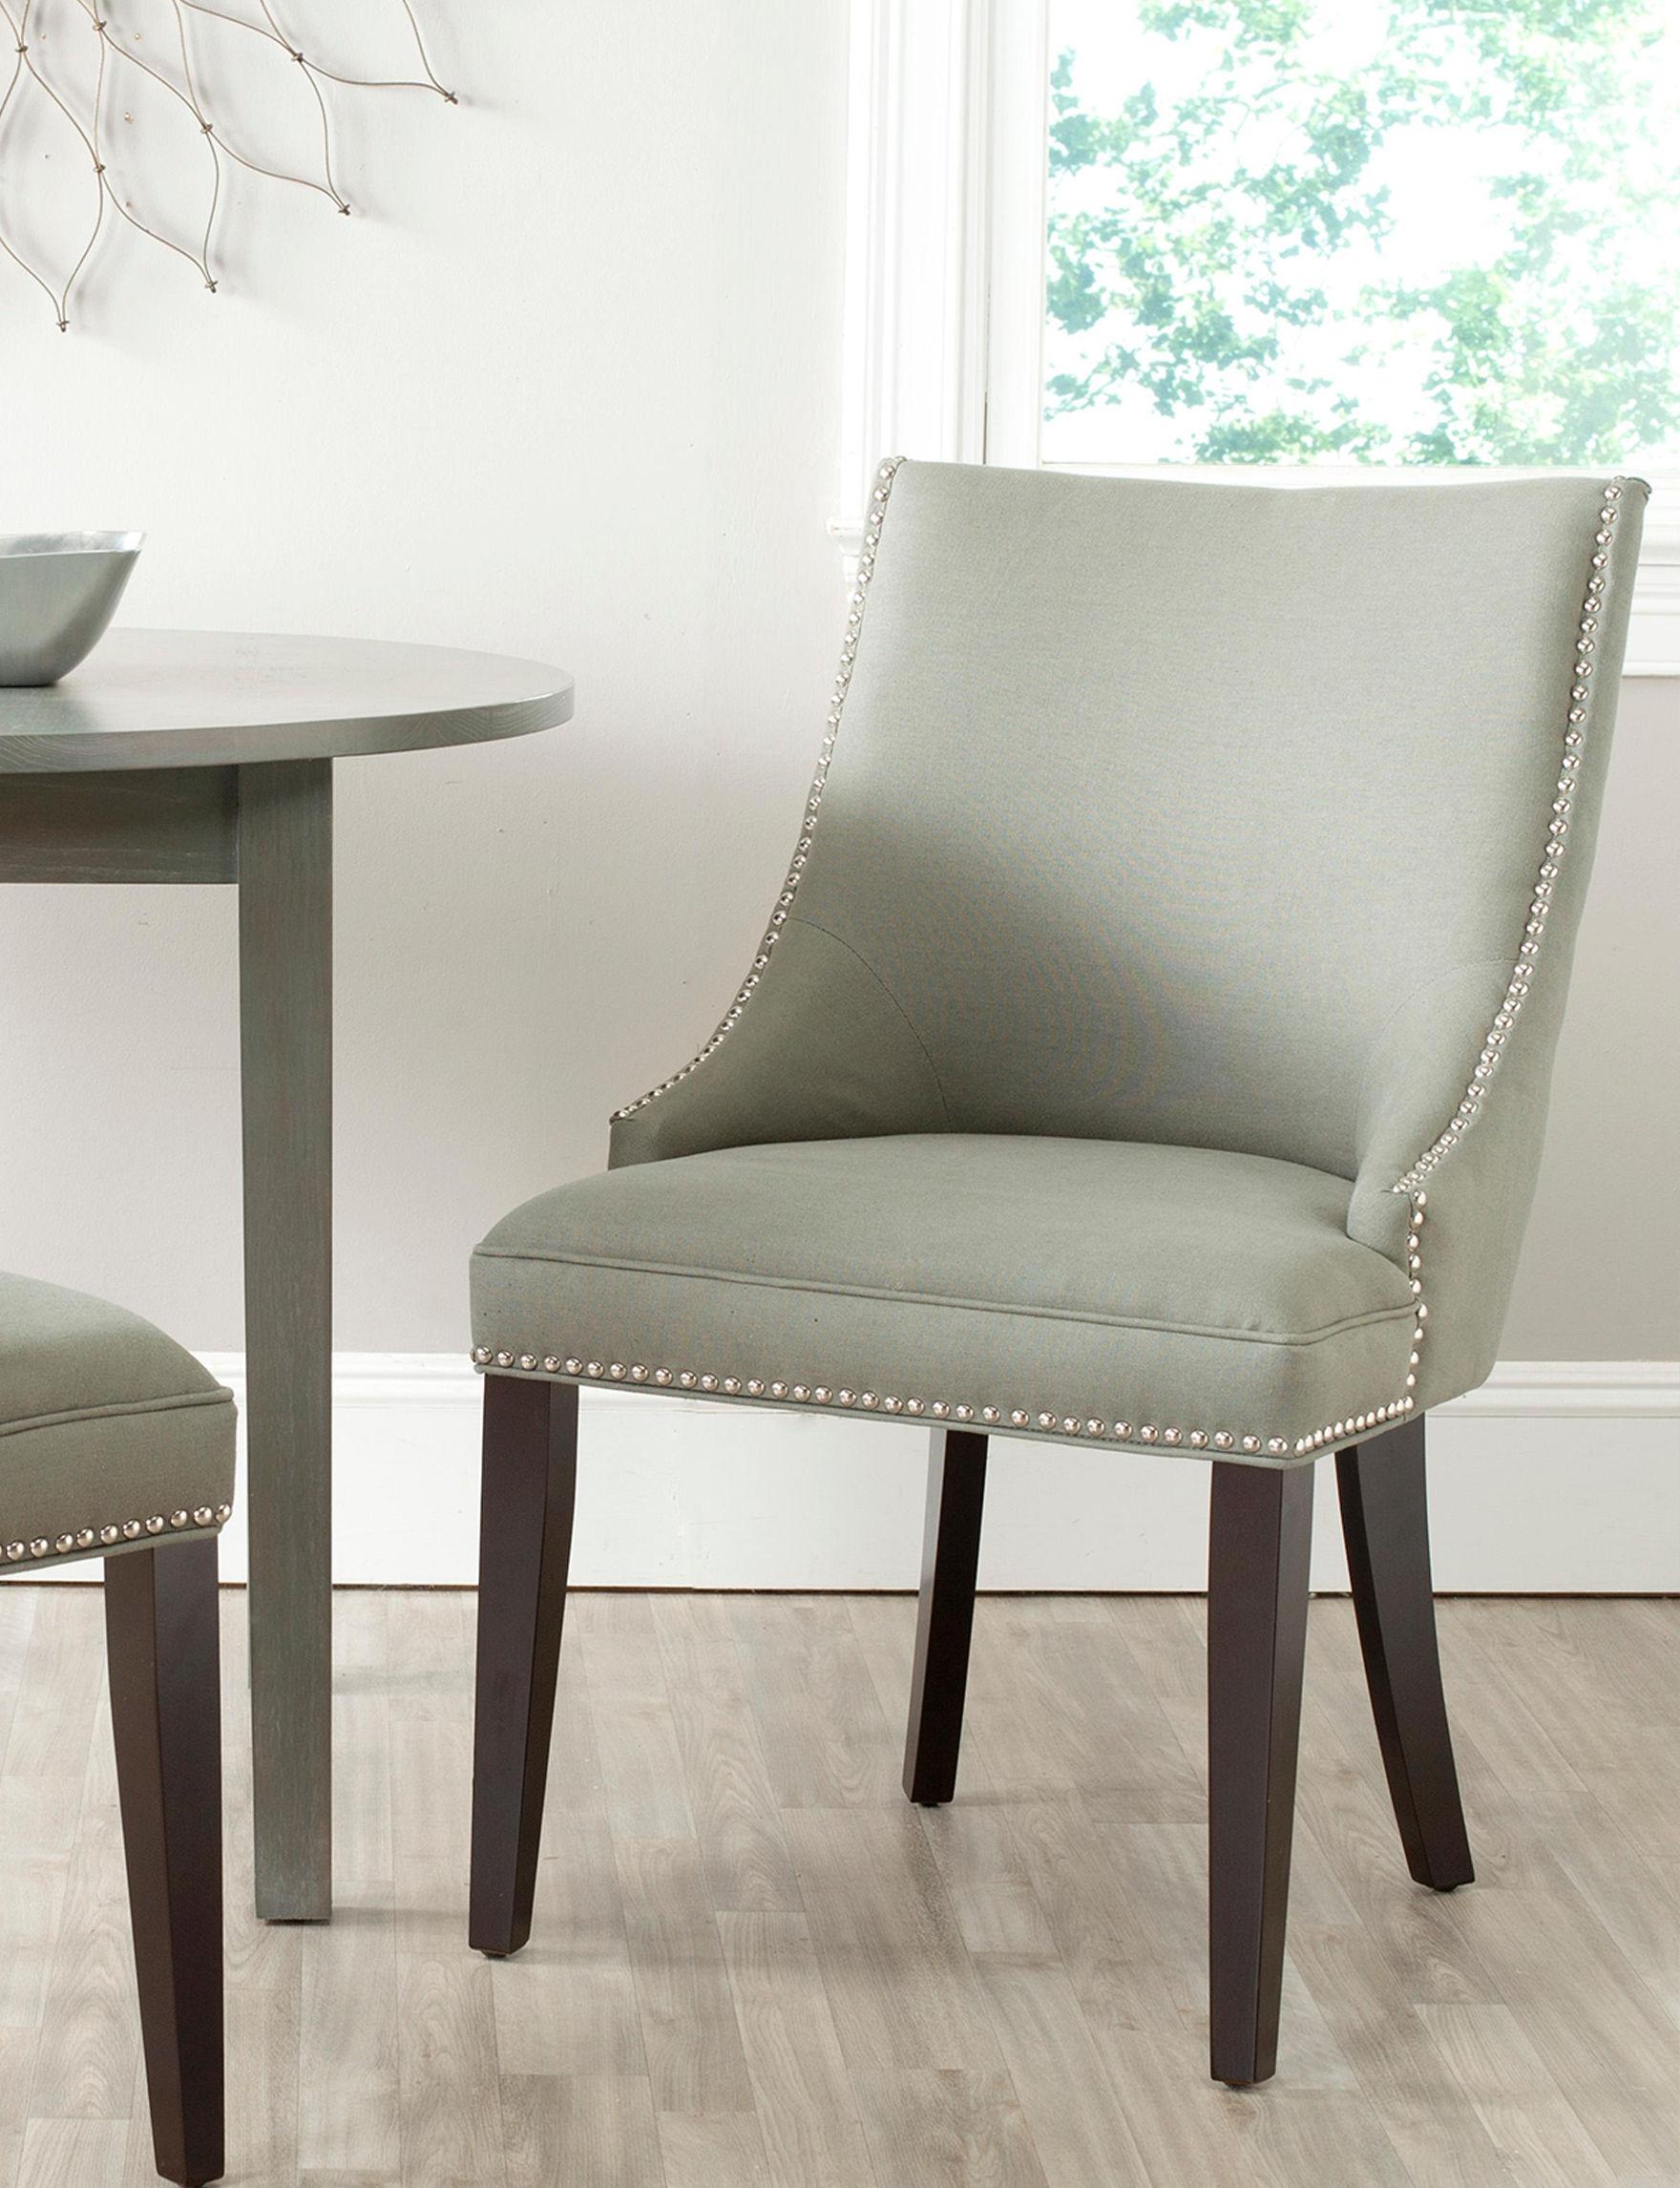 Safavieh Granite Dining Chairs Kitchen & Dining Furniture